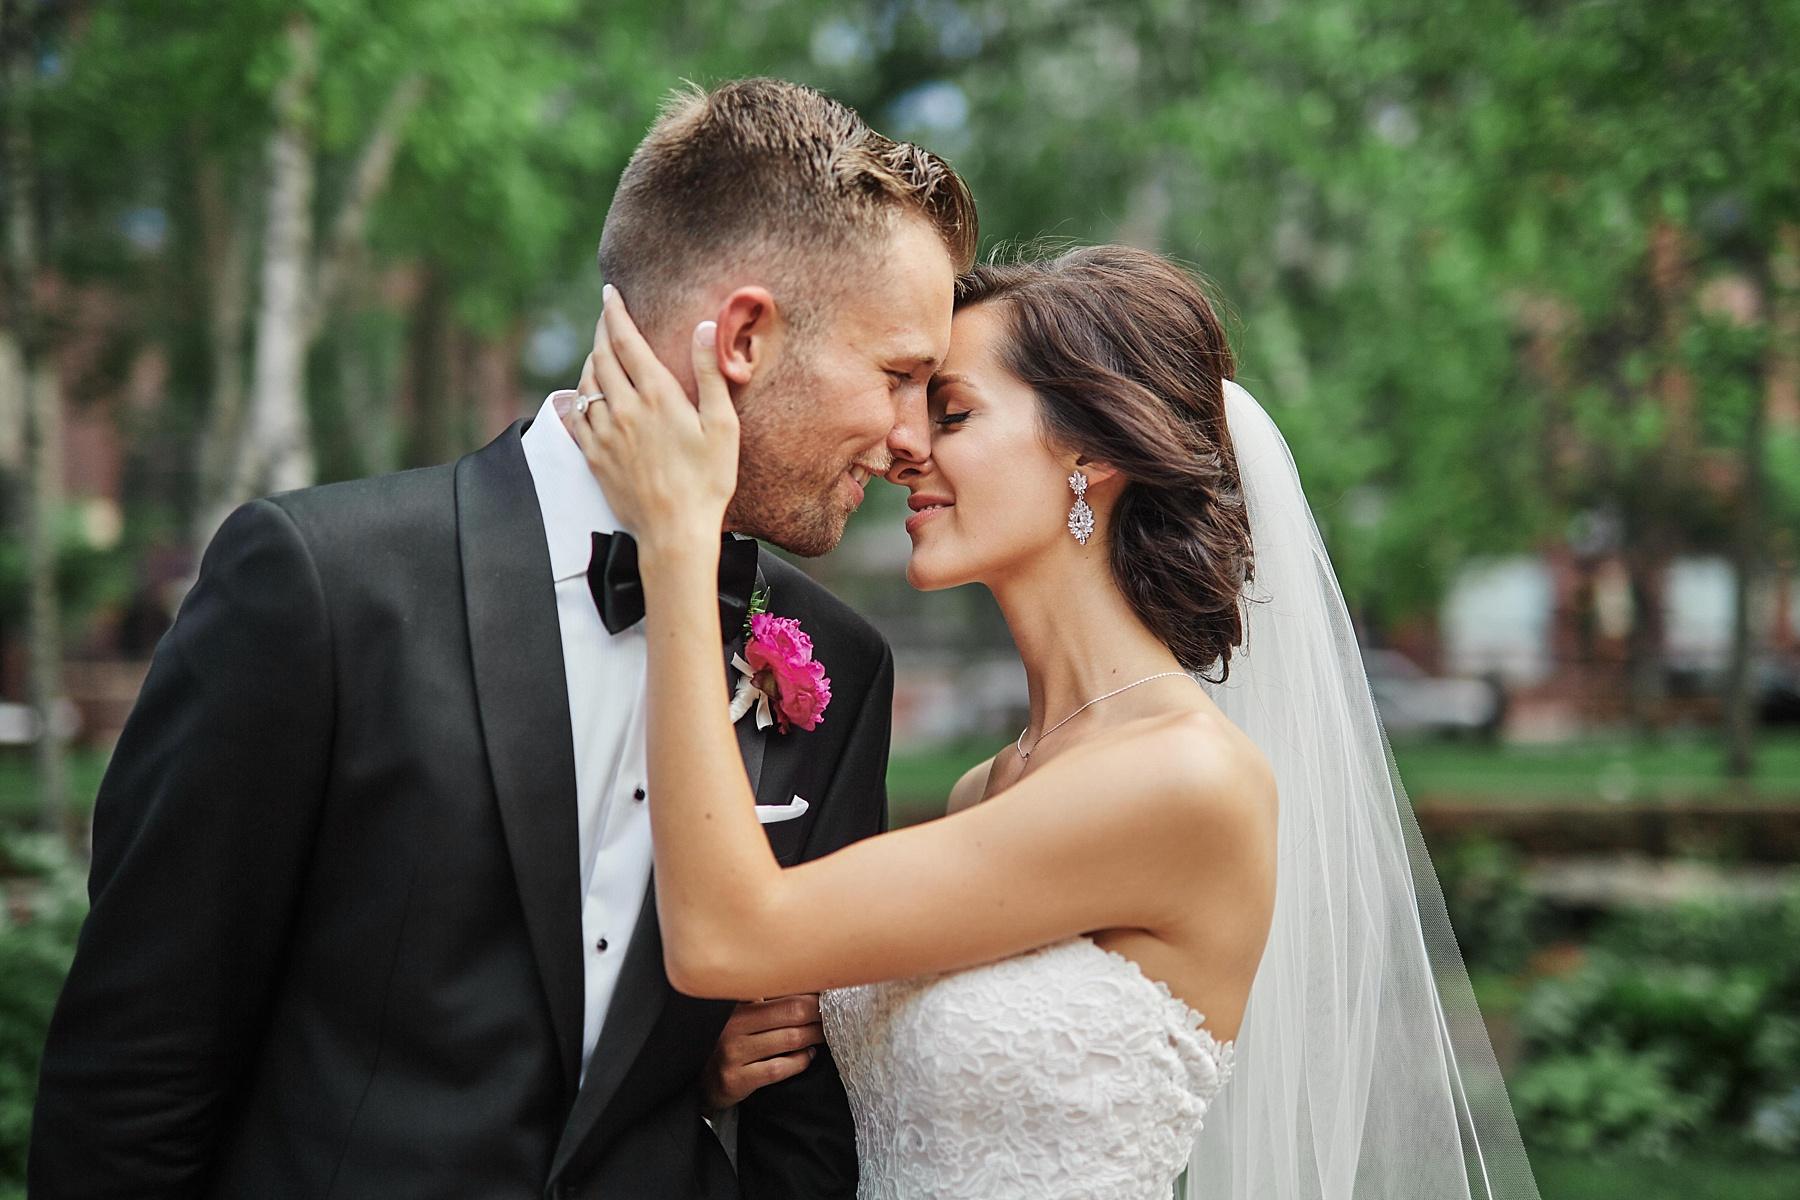 ABULAE-Wedding-Saint-paul-MN-Josh-Sofia-Wedding-Mears-Park_0783.jpg